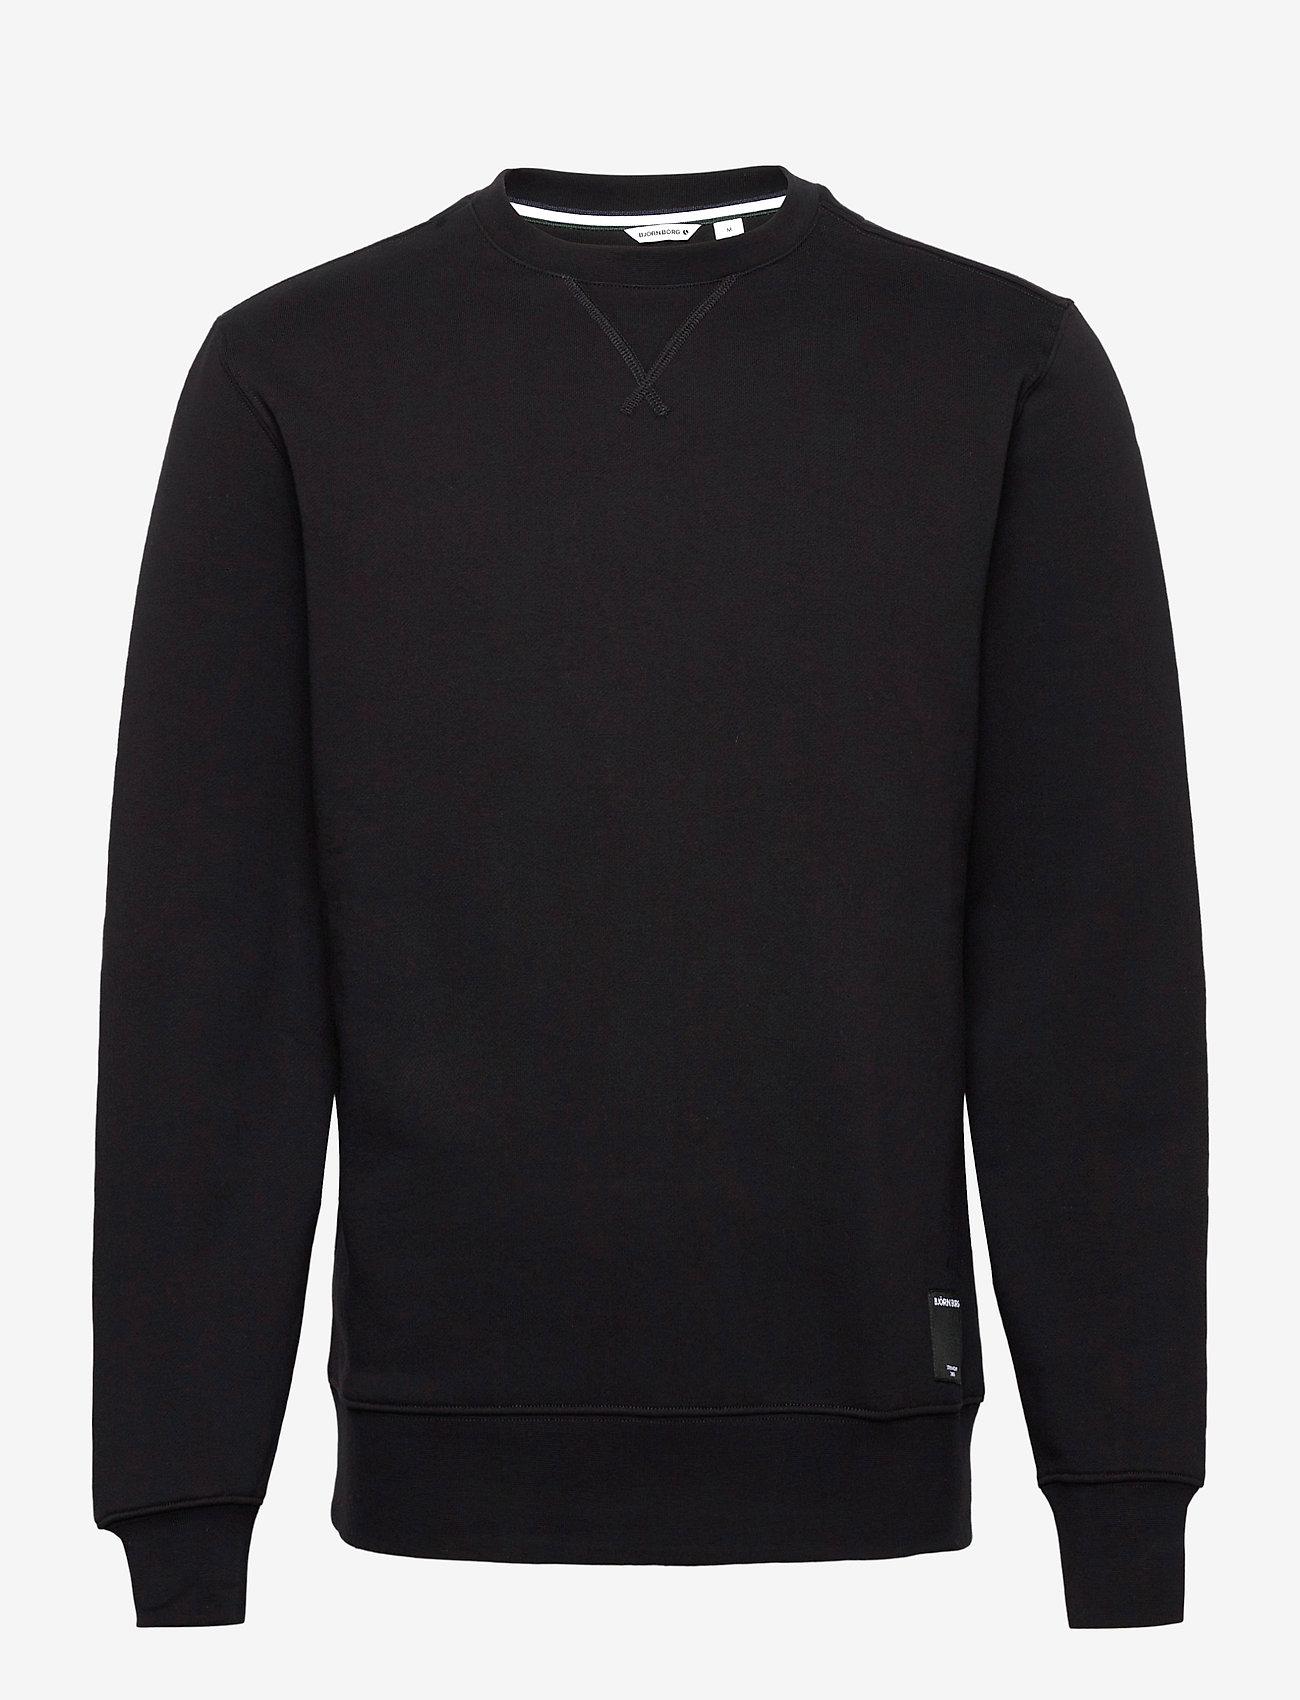 Björn Borg - CREW CENTRE CENTRE - basic sweatshirts - black beauty - 0